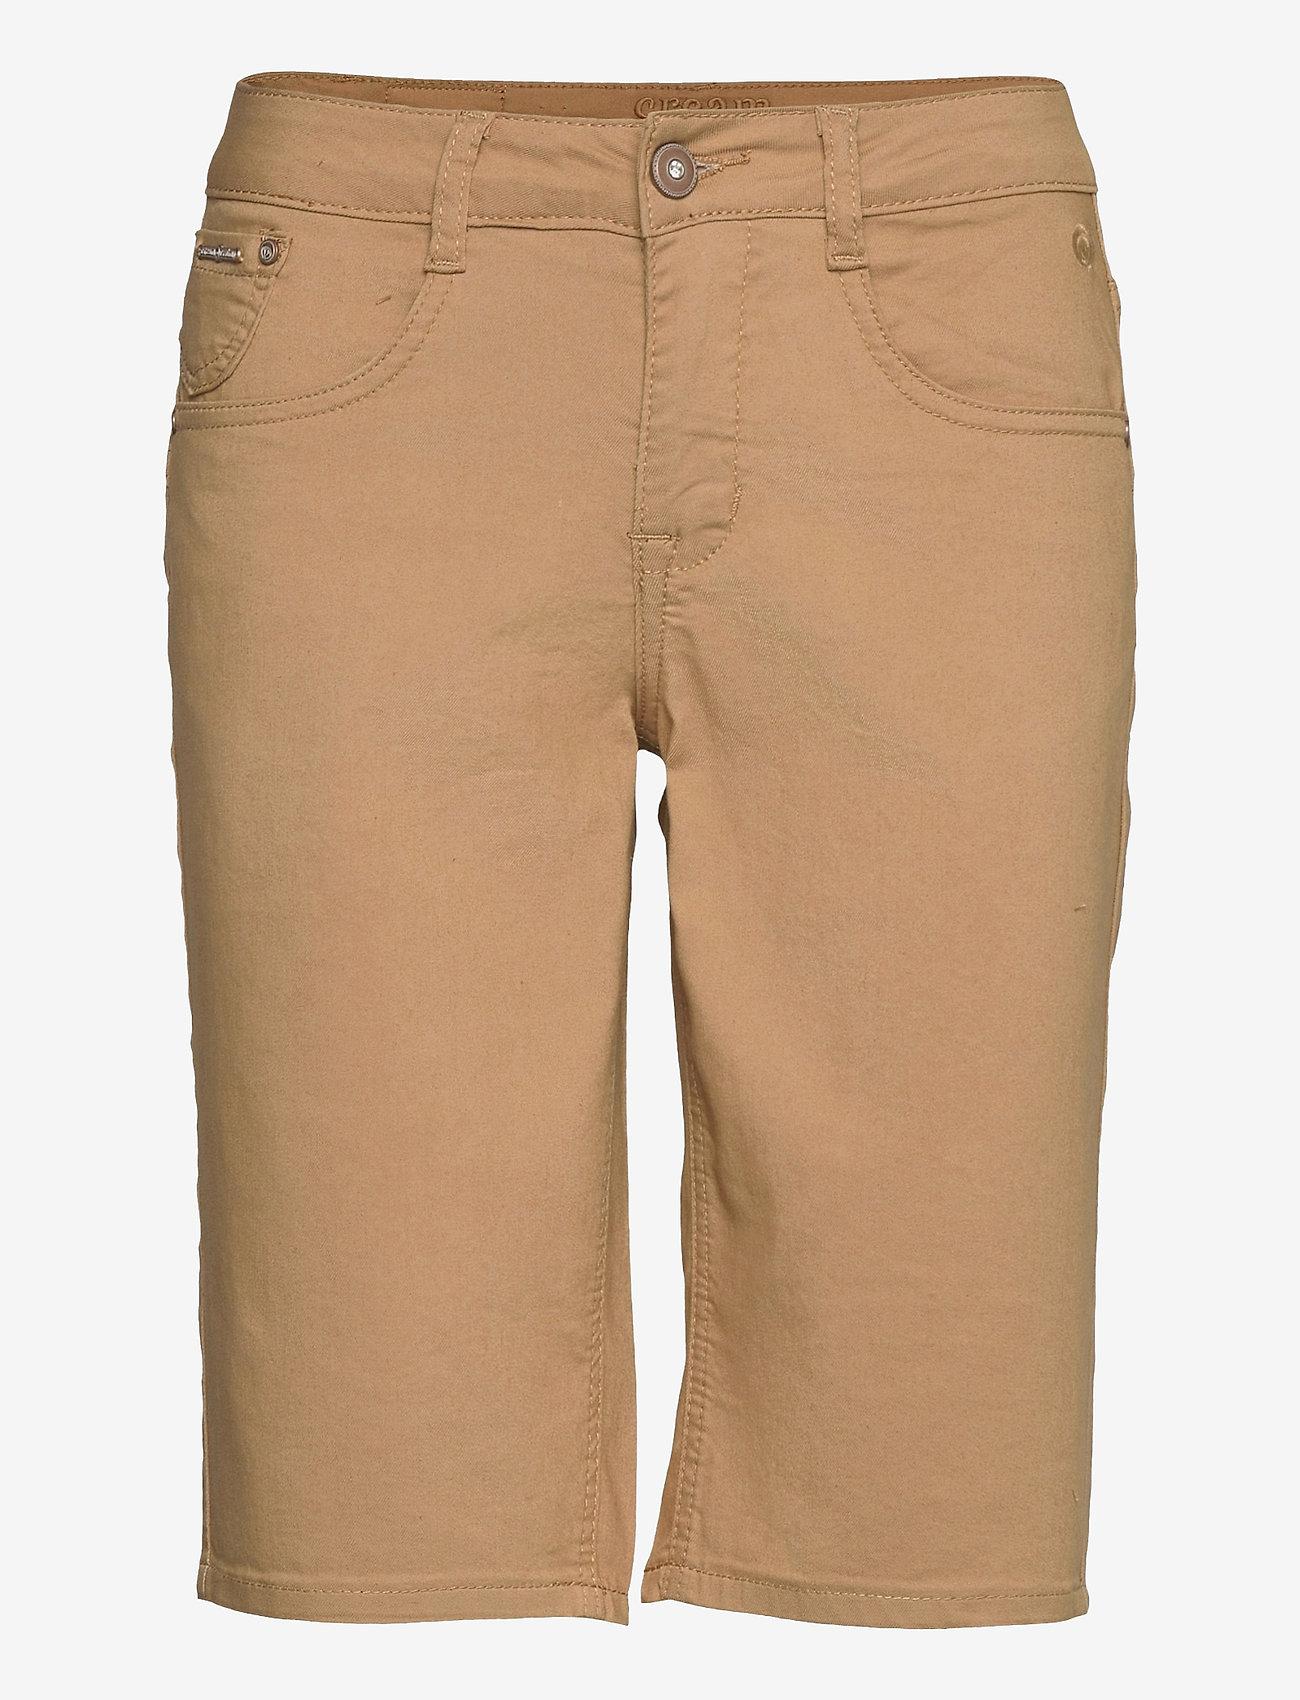 Cream - VavaCR Shorts - Coco Fit - bermudas - tannin - 0